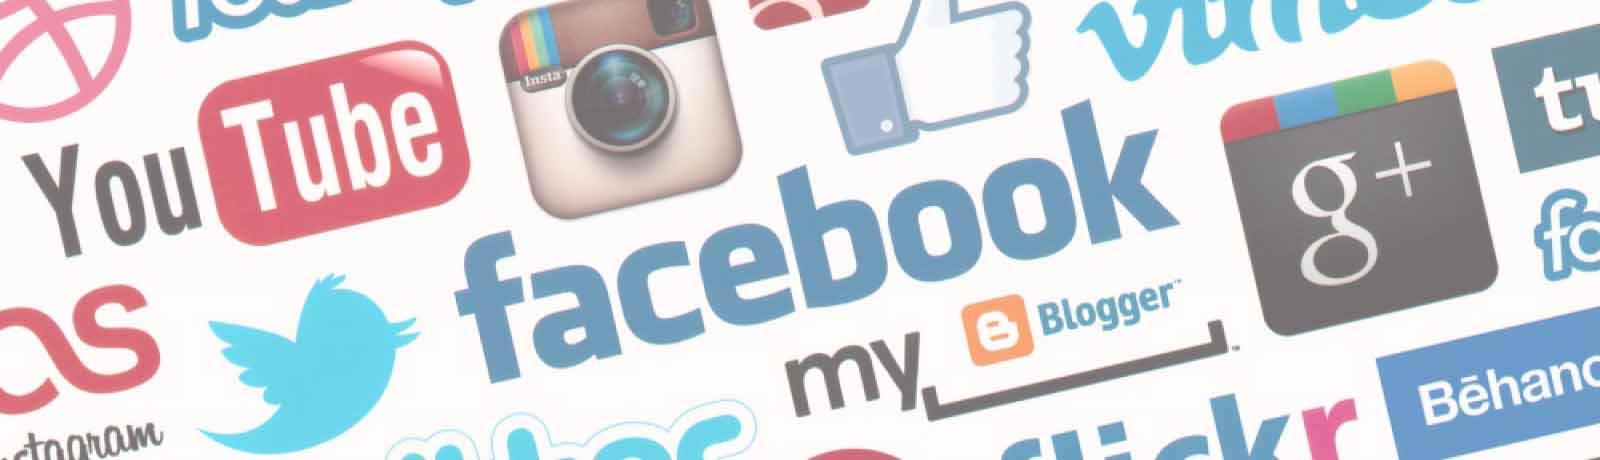 usa redes sociales